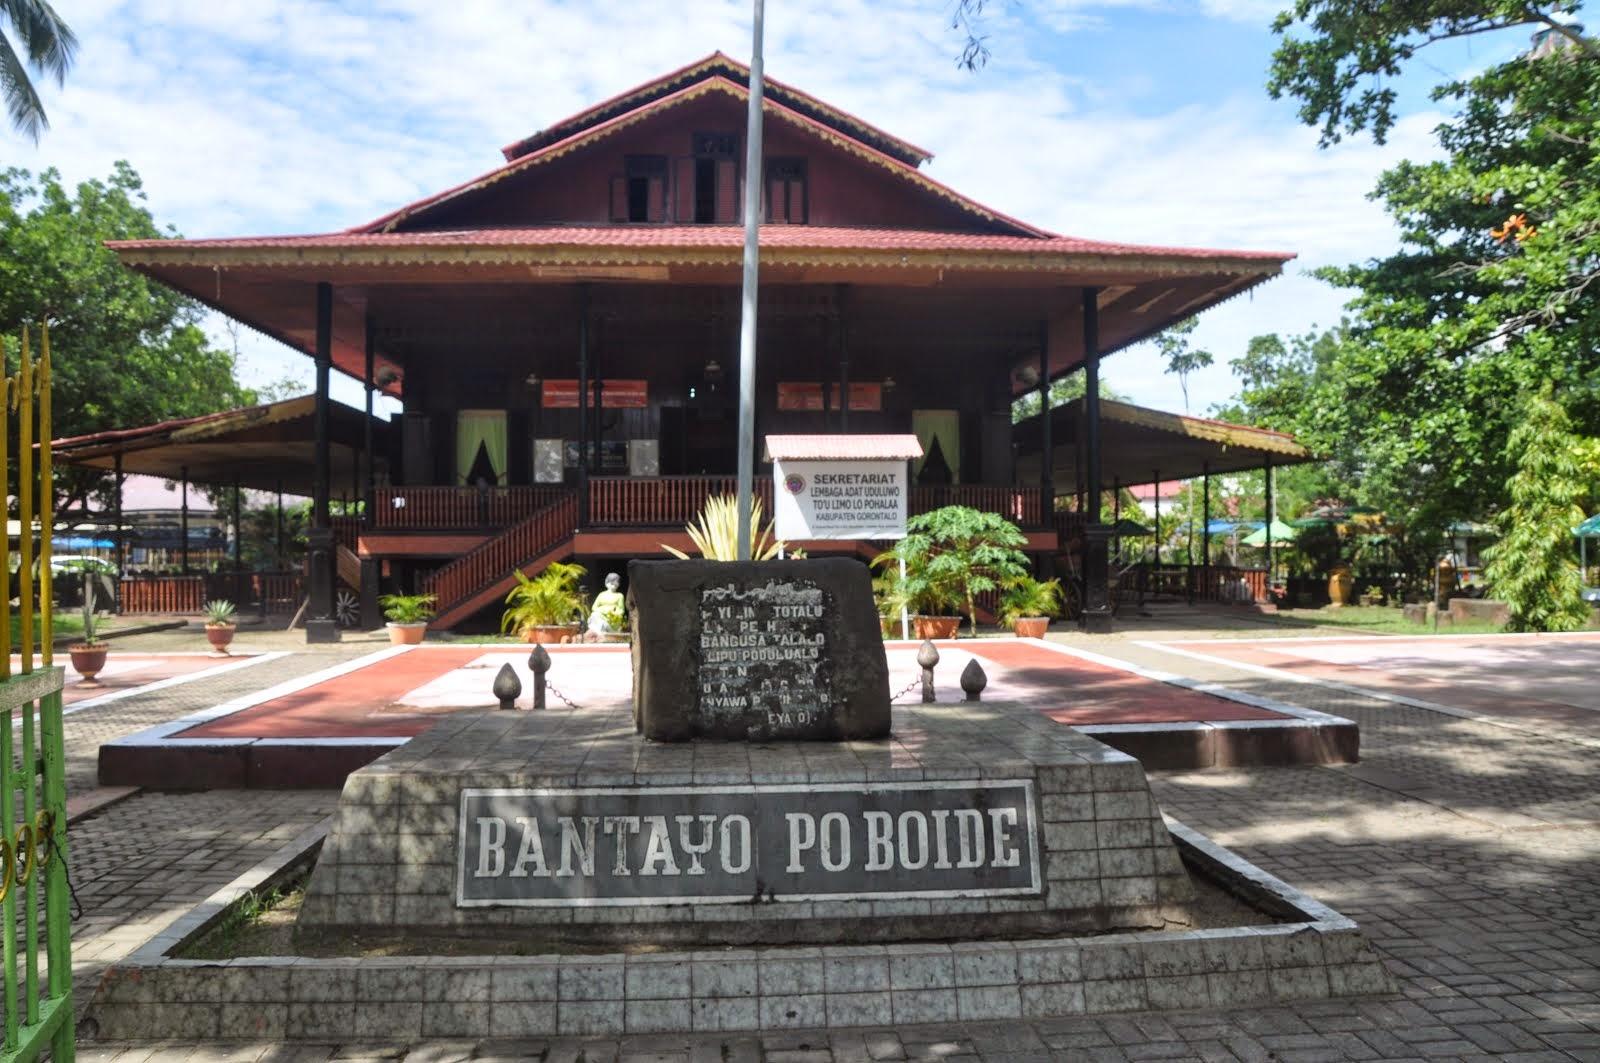 Kecamatan Limboto Keberadaan Rumah Adat Disebut Bantayo Po Boide Kabupaten